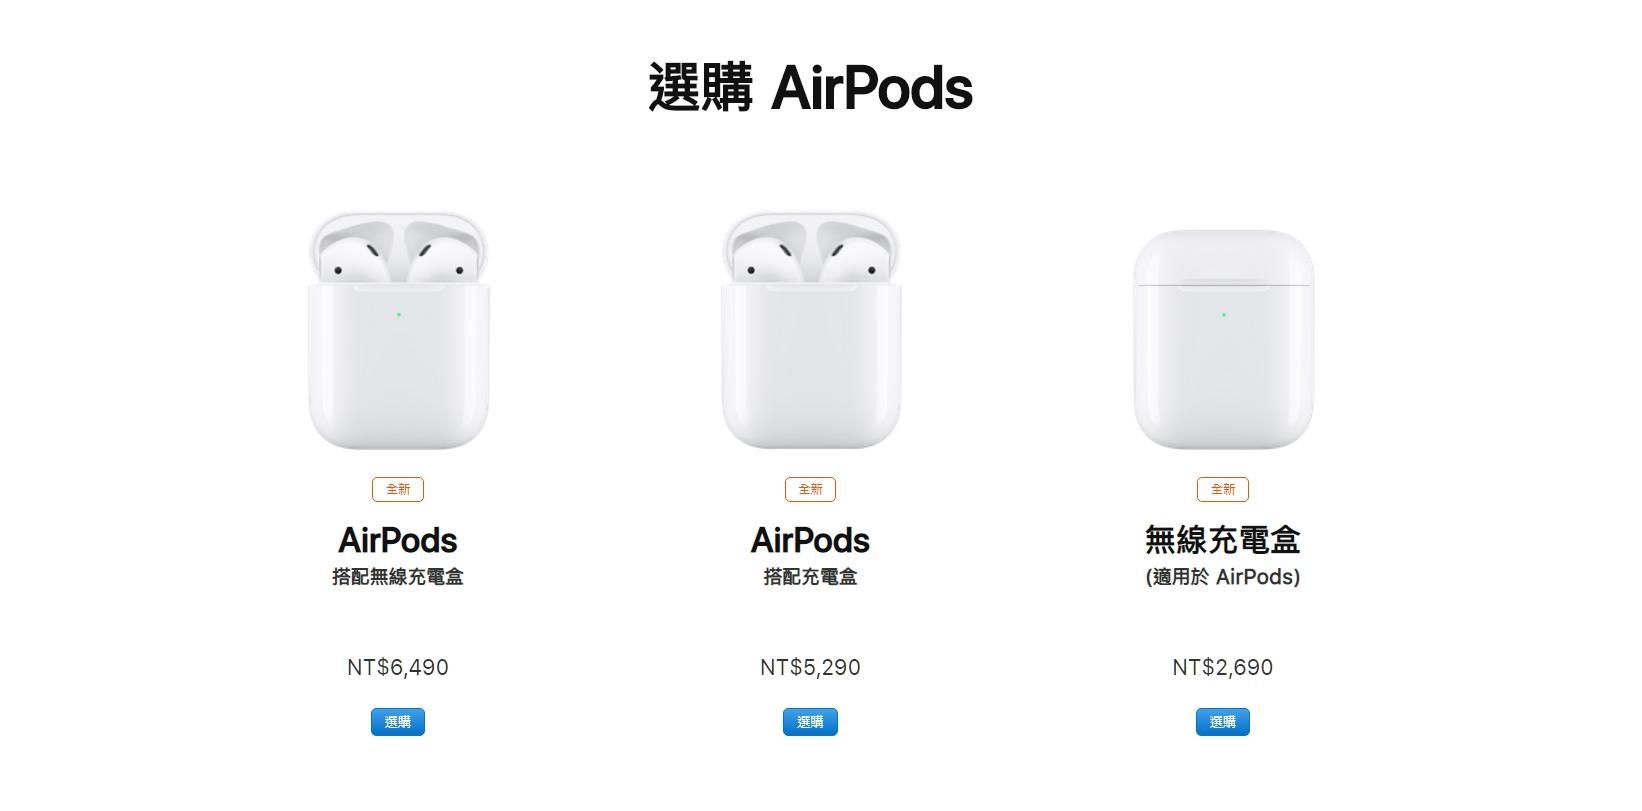 AirPods 三種選購方式